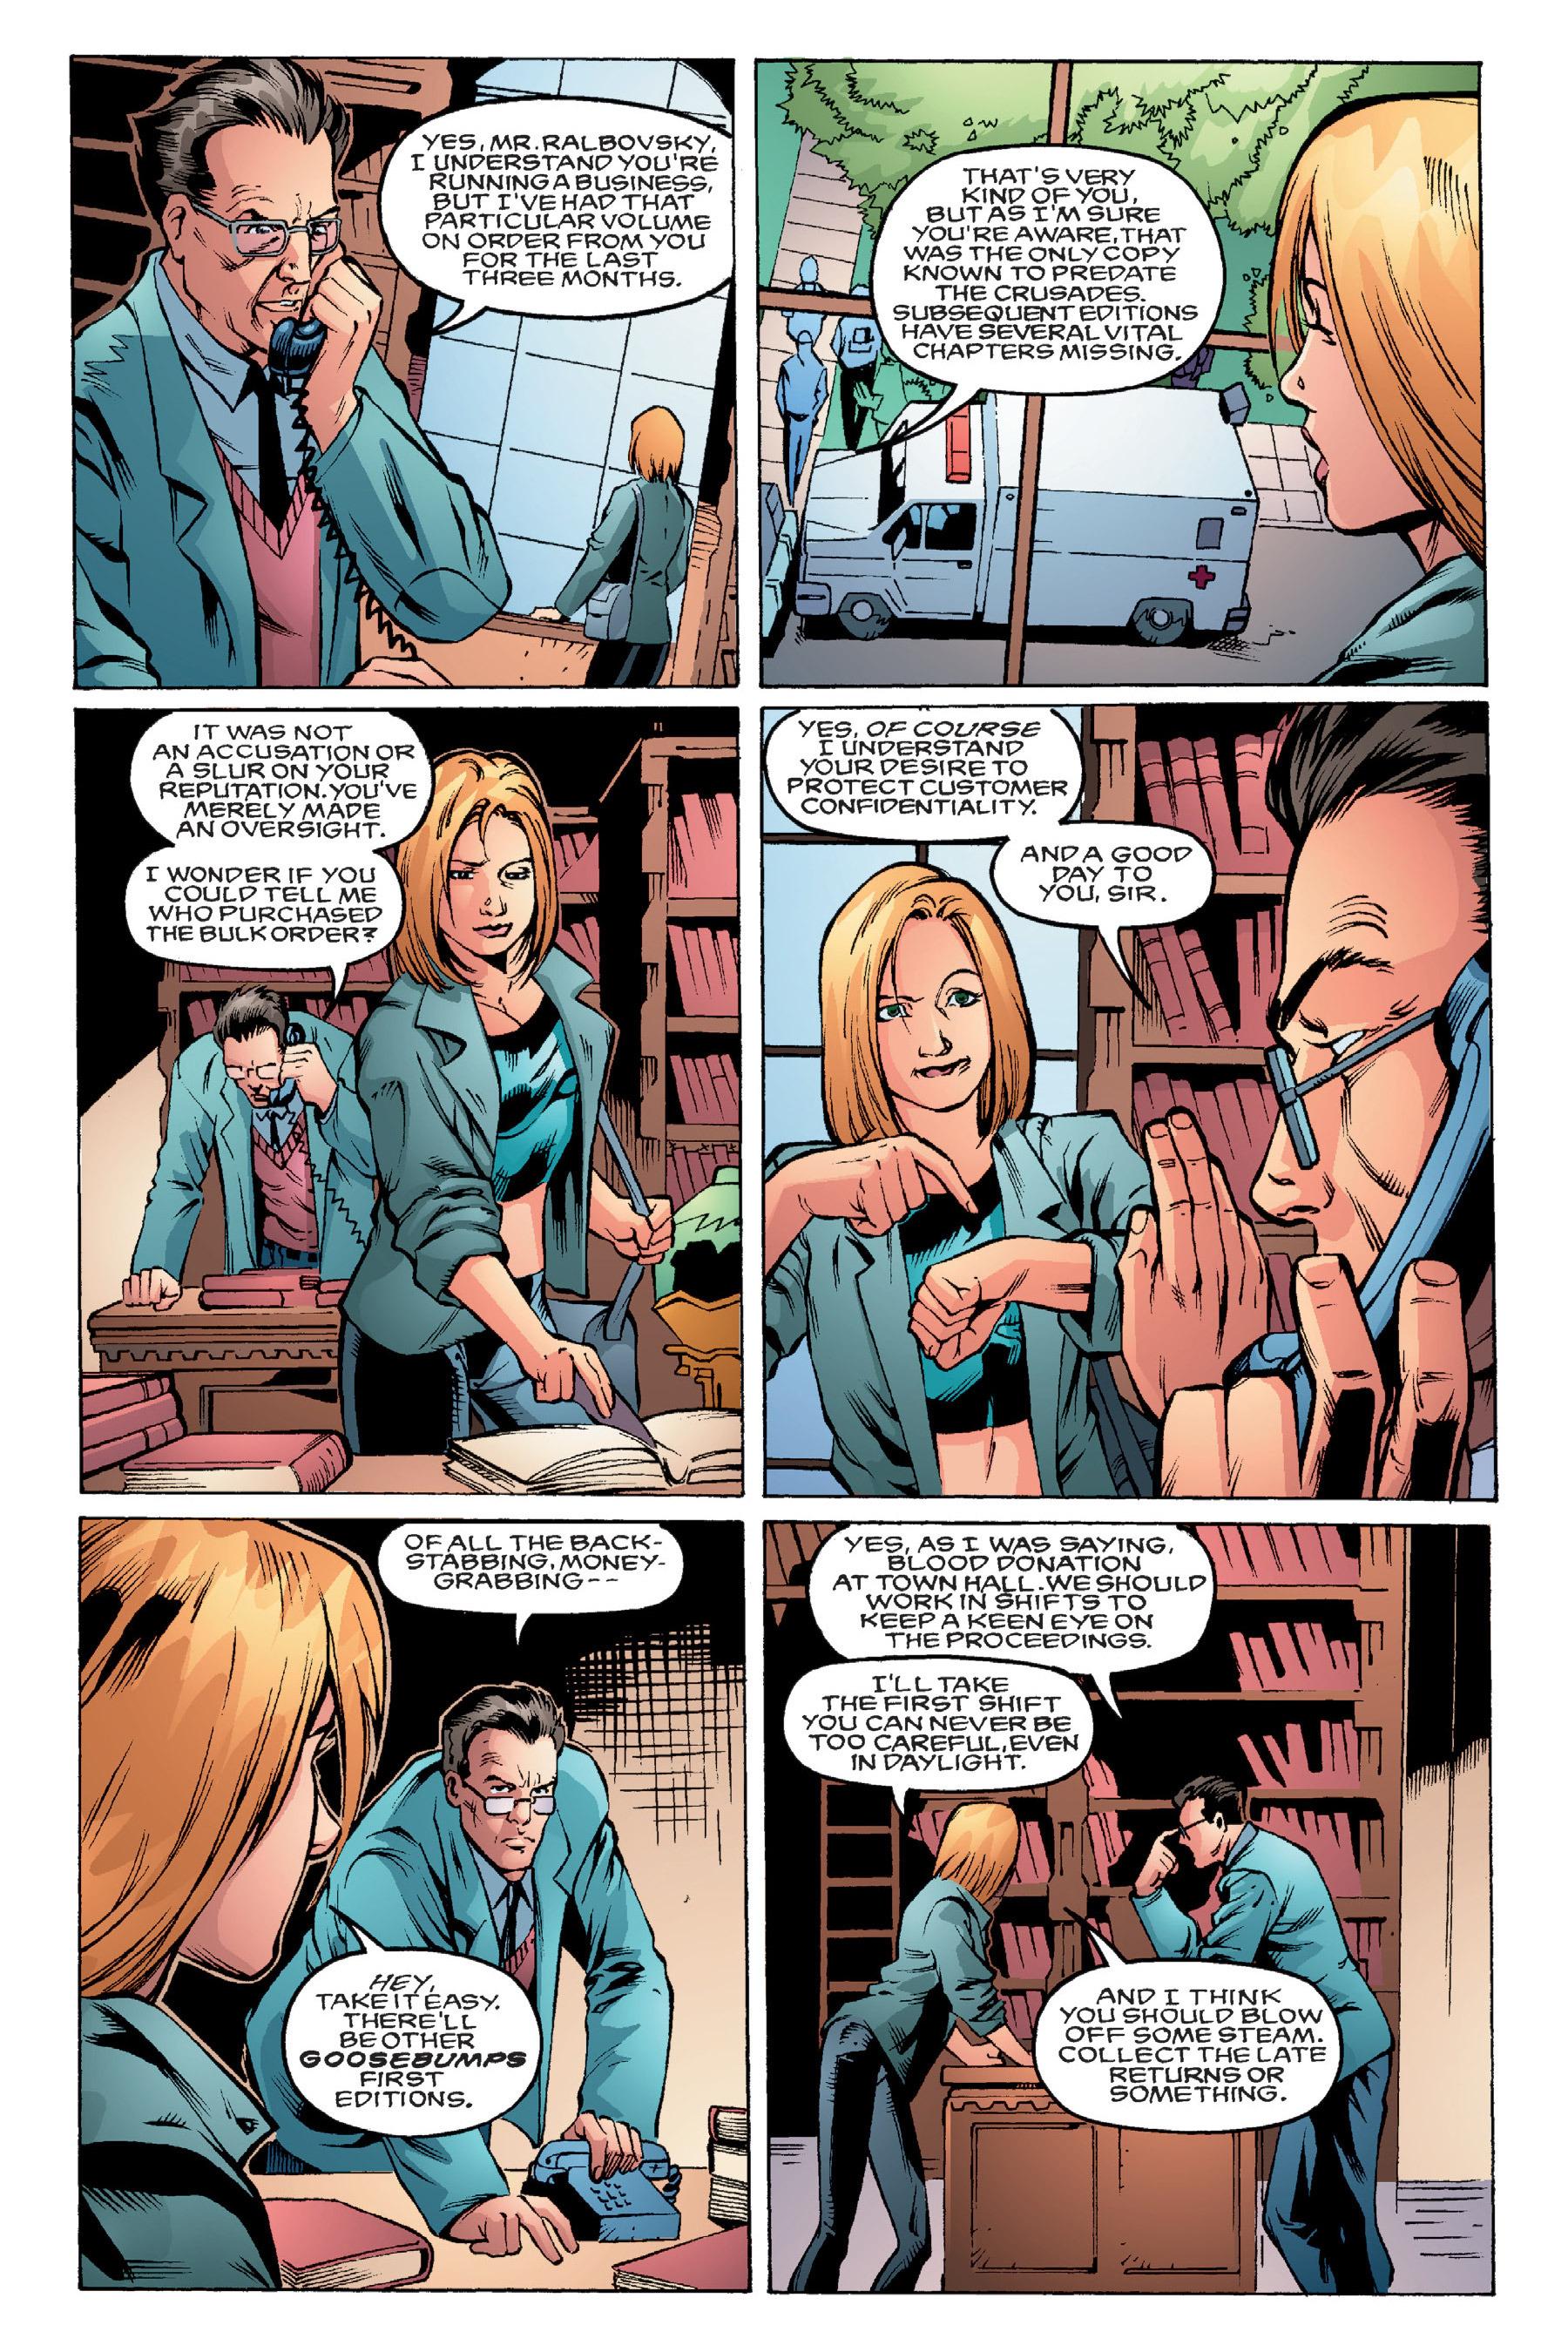 Read online Buffy the Vampire Slayer: Omnibus comic -  Issue # TPB 4 - 56